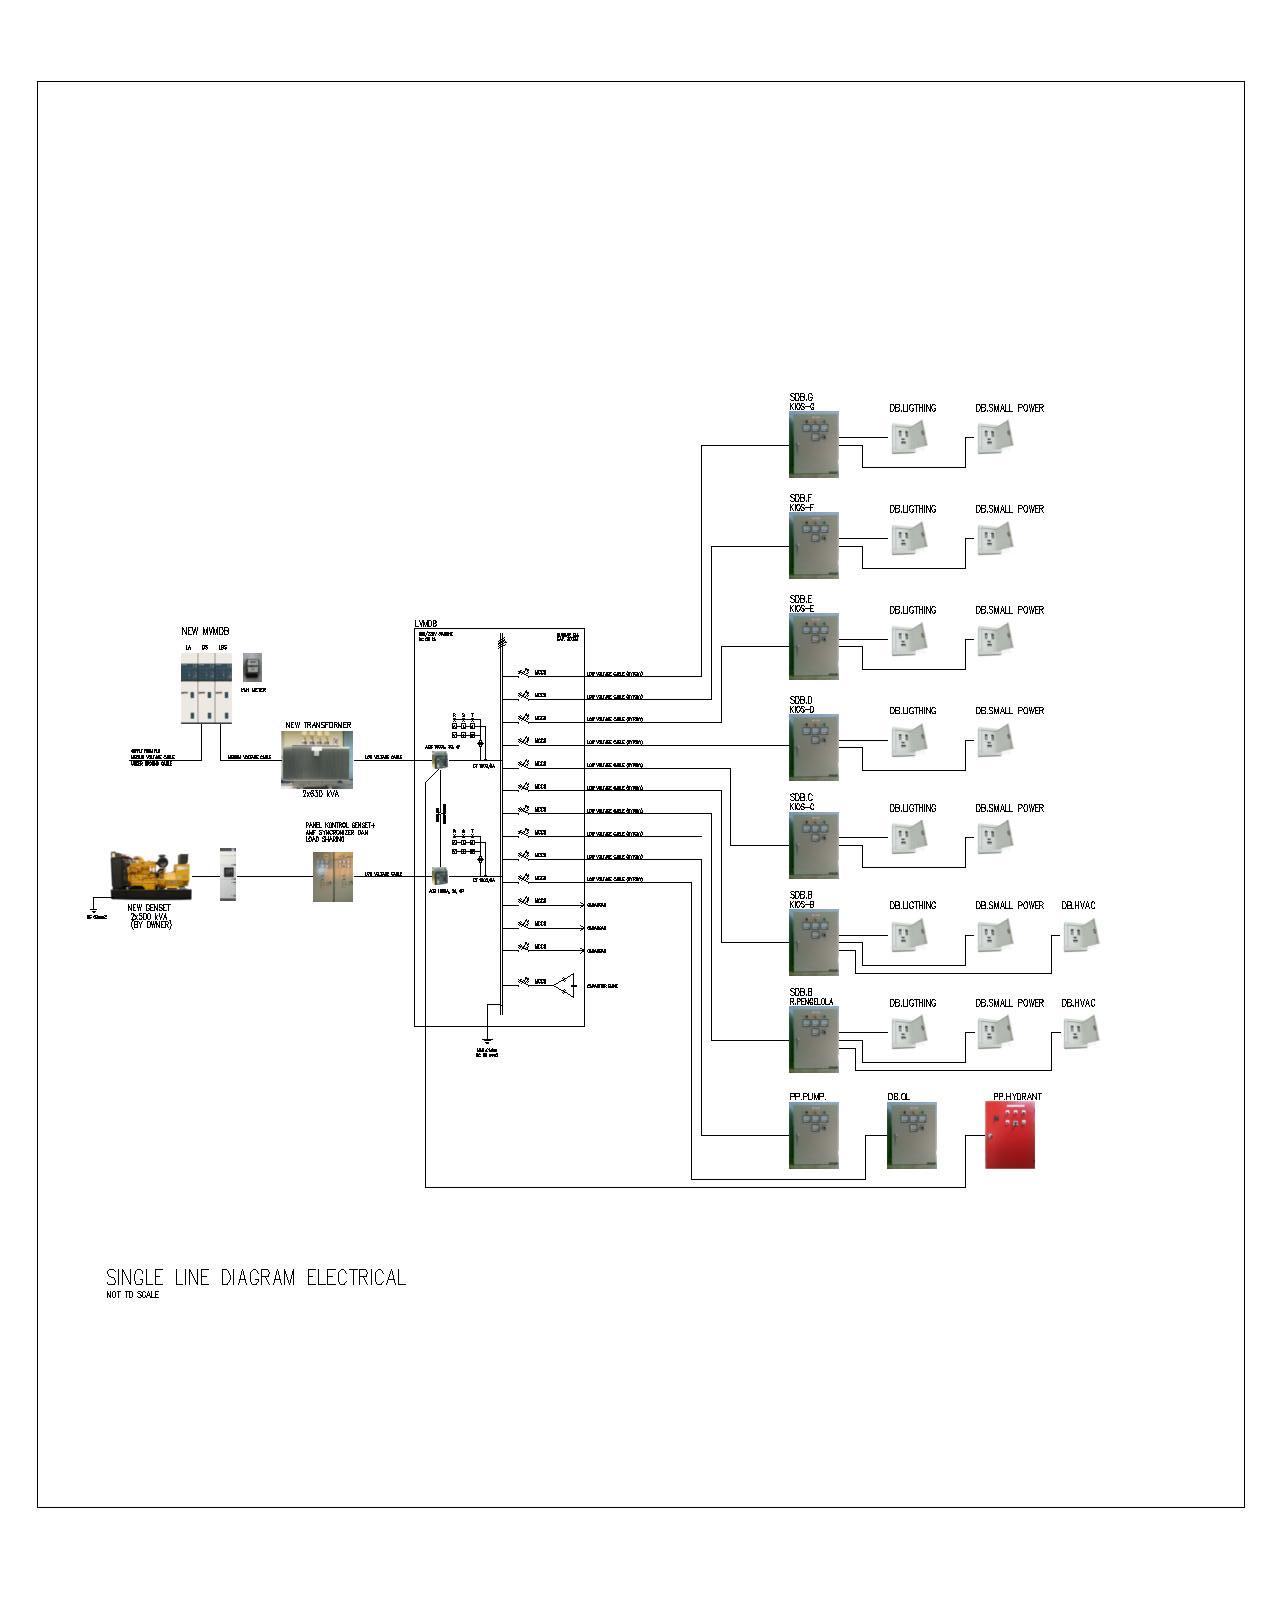 Mep Mekanikal Elektrikal Plambing Diagram Satu Garis